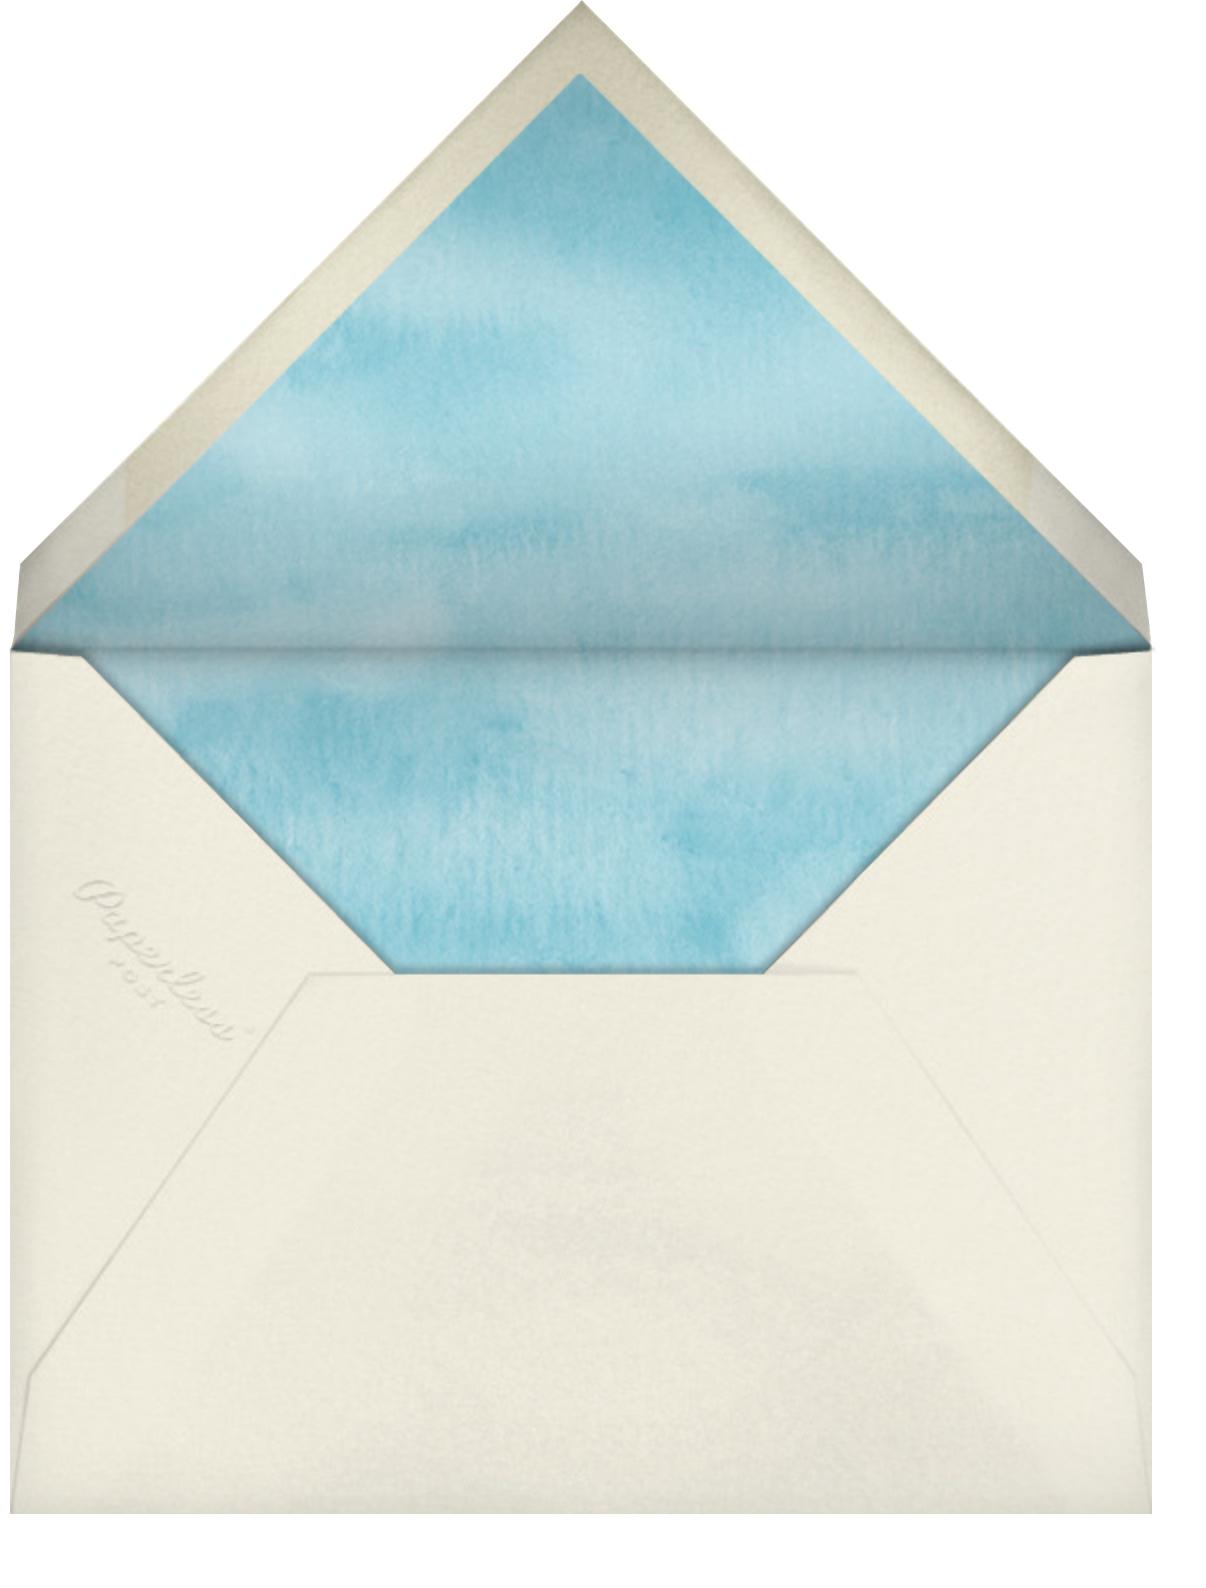 Light and Laughter - Felix Doolittle - Hanukkah - envelope back